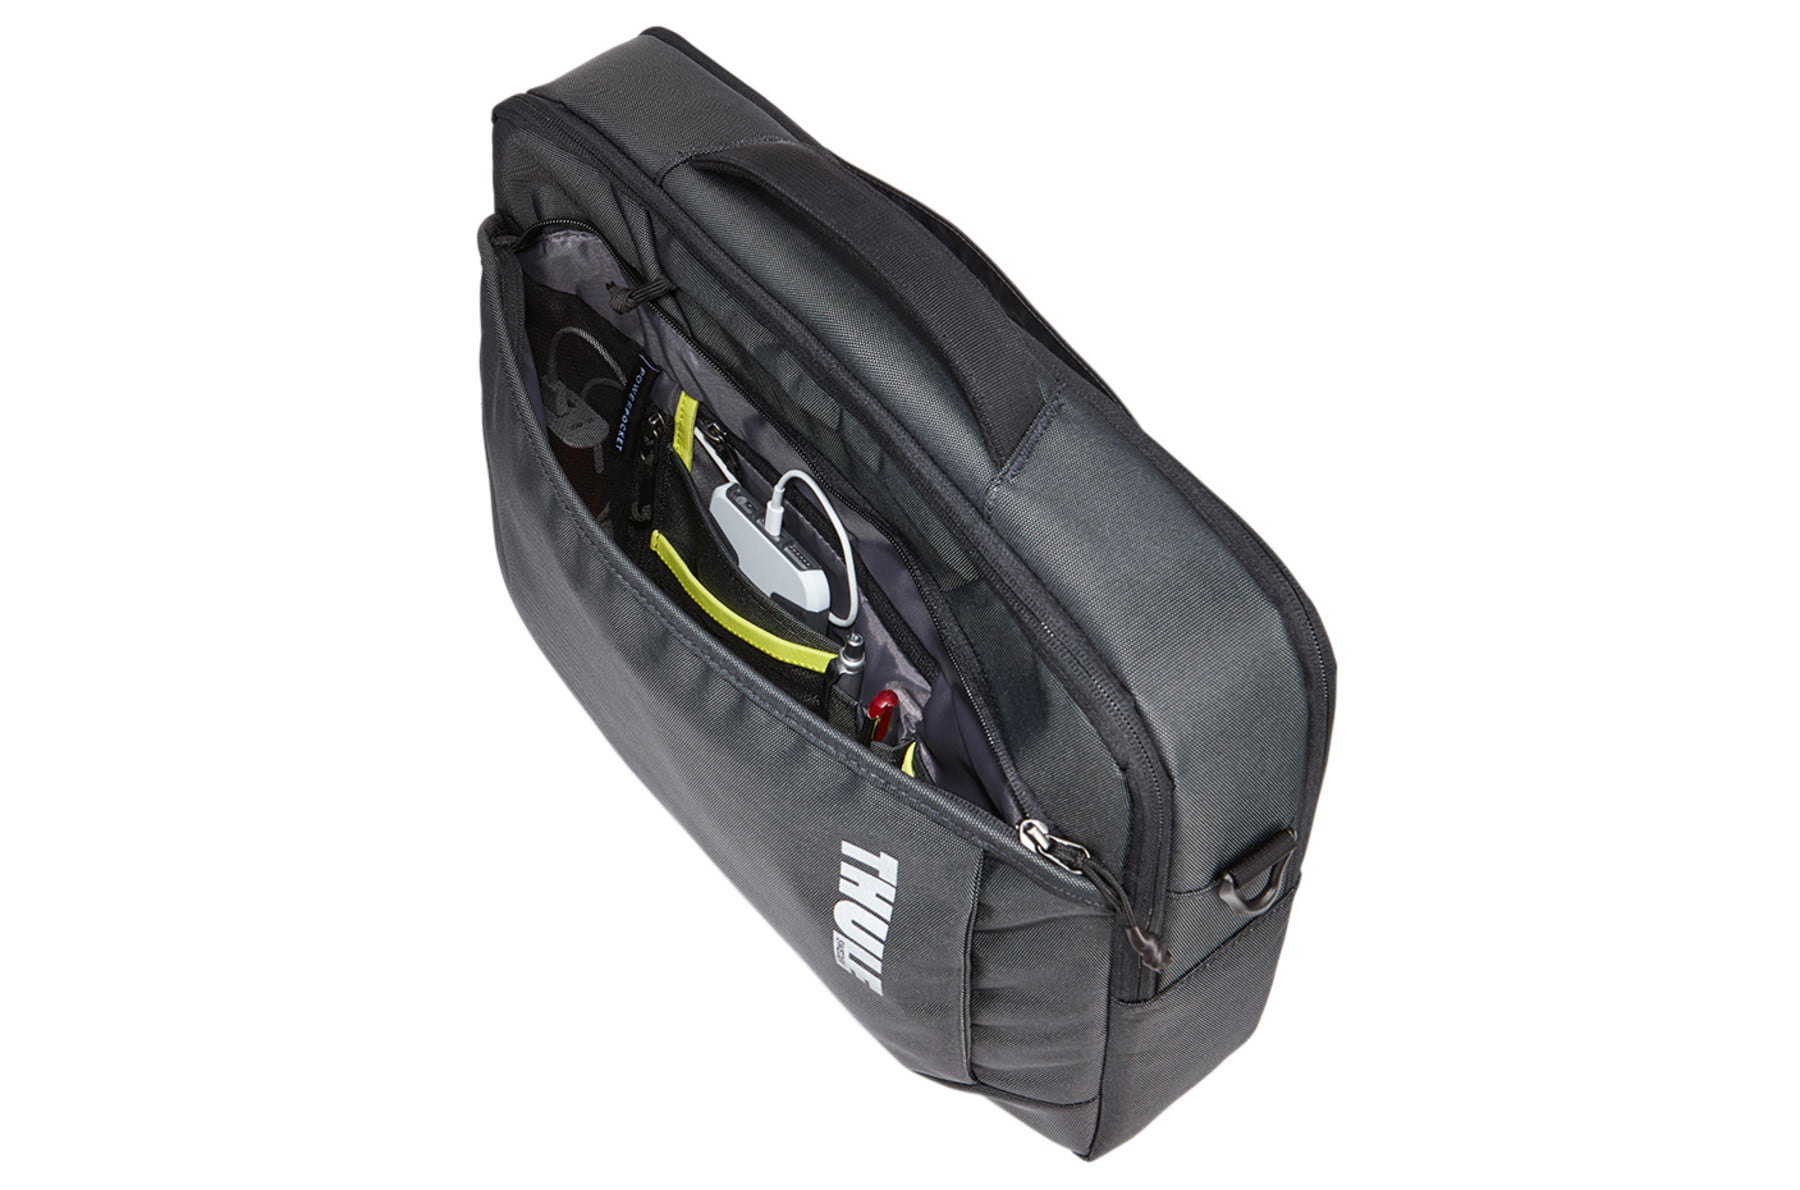 Geanta laptop Thule Subterra Laptop Bag 15.6 inchi 5